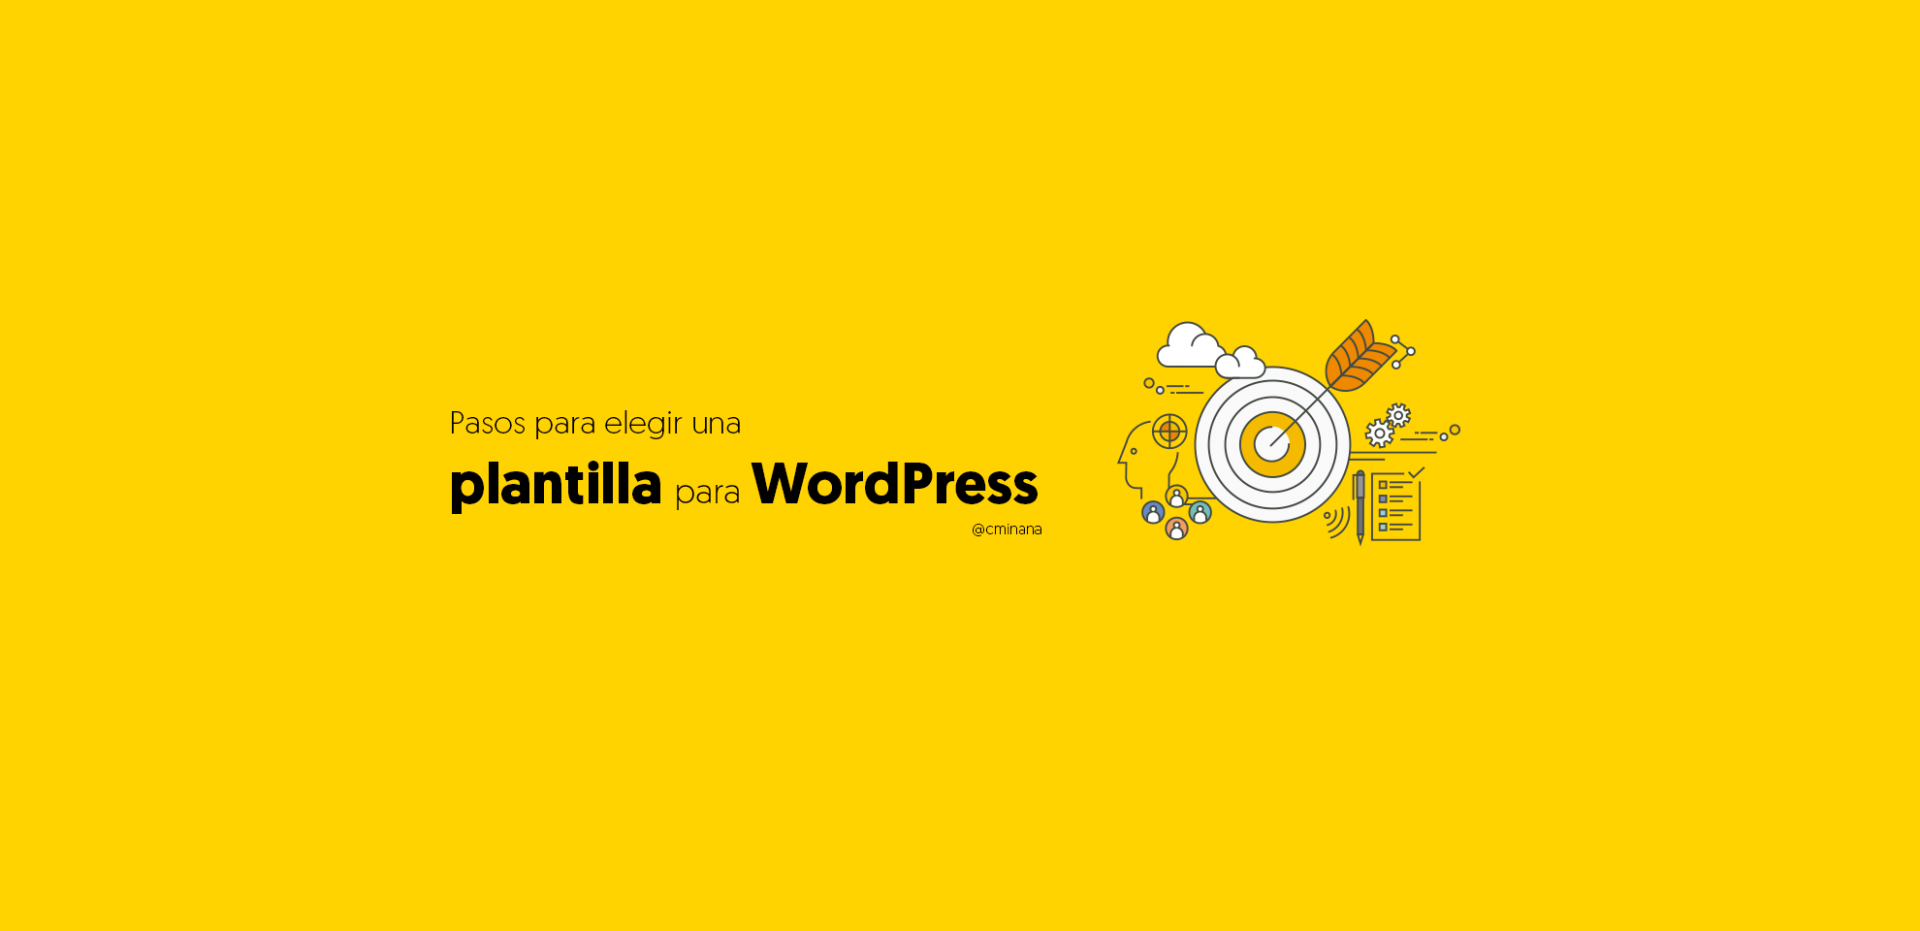 pasos elegir plantilla para wordpress